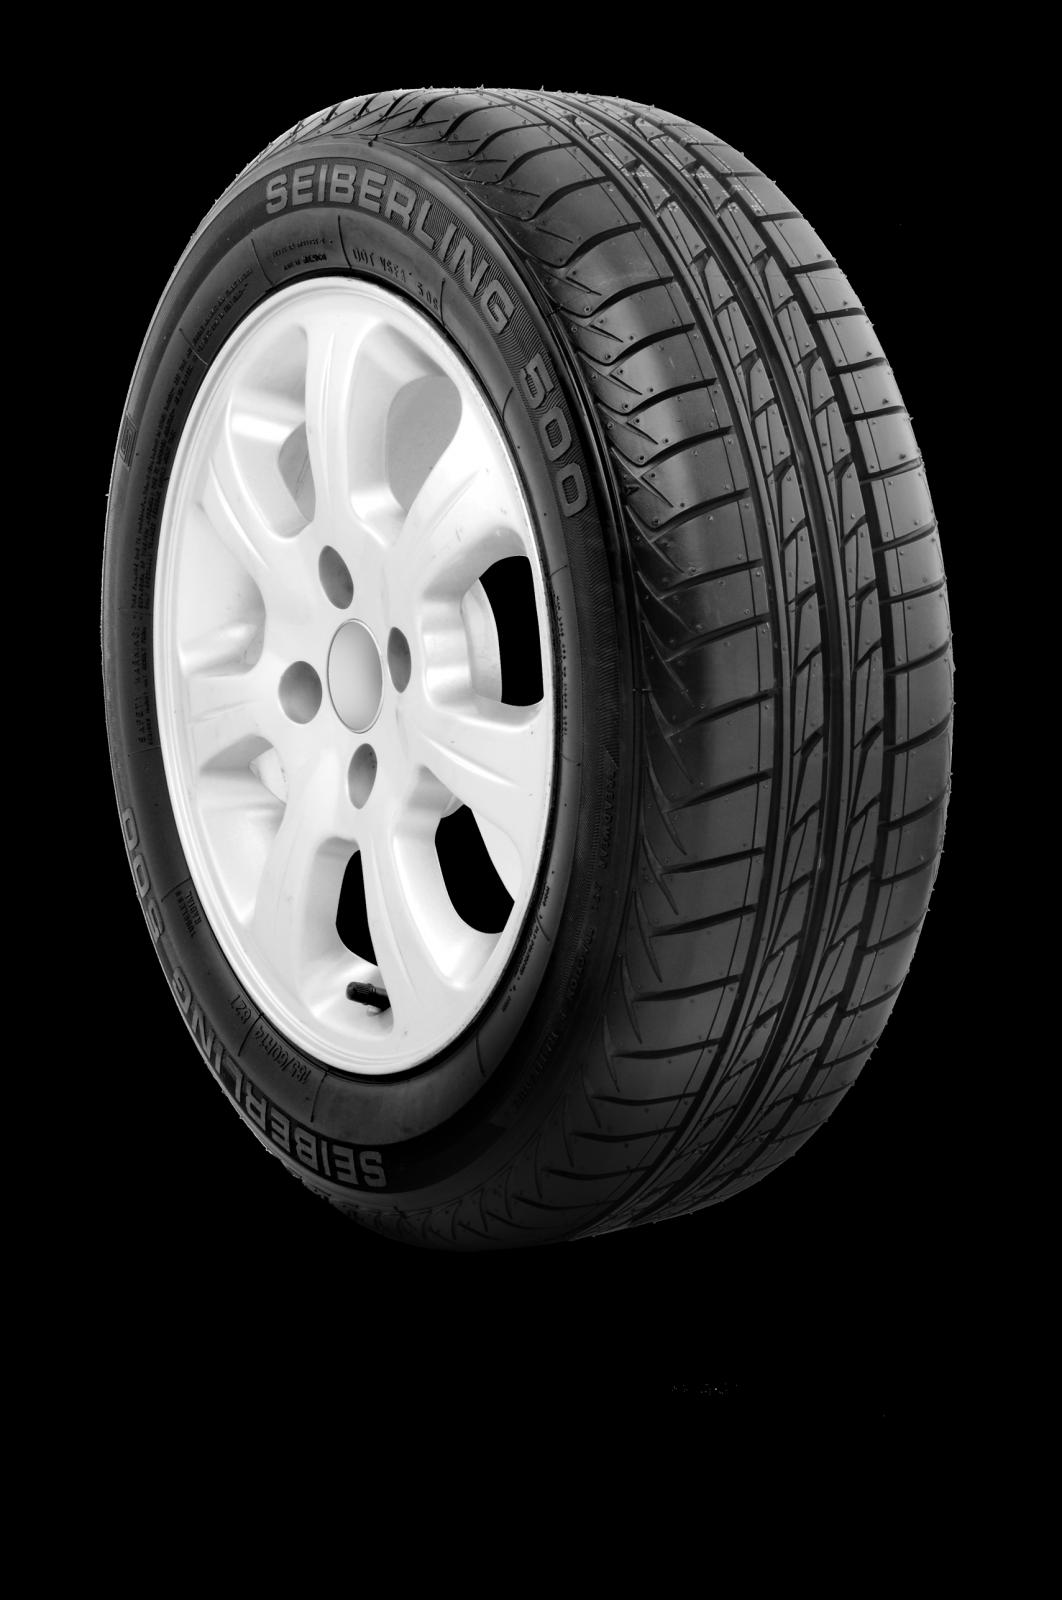 pneu 165 70 r13 seiberling tr 79t brizola pneus. Black Bedroom Furniture Sets. Home Design Ideas